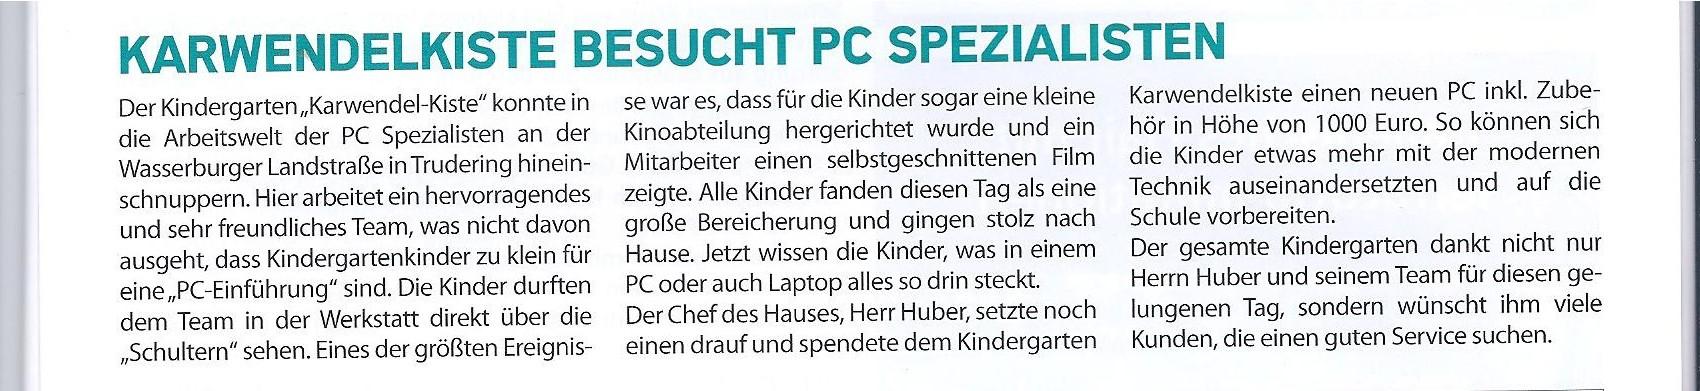 Presseart._Lebendiges-Vaterstetten-08_12-001